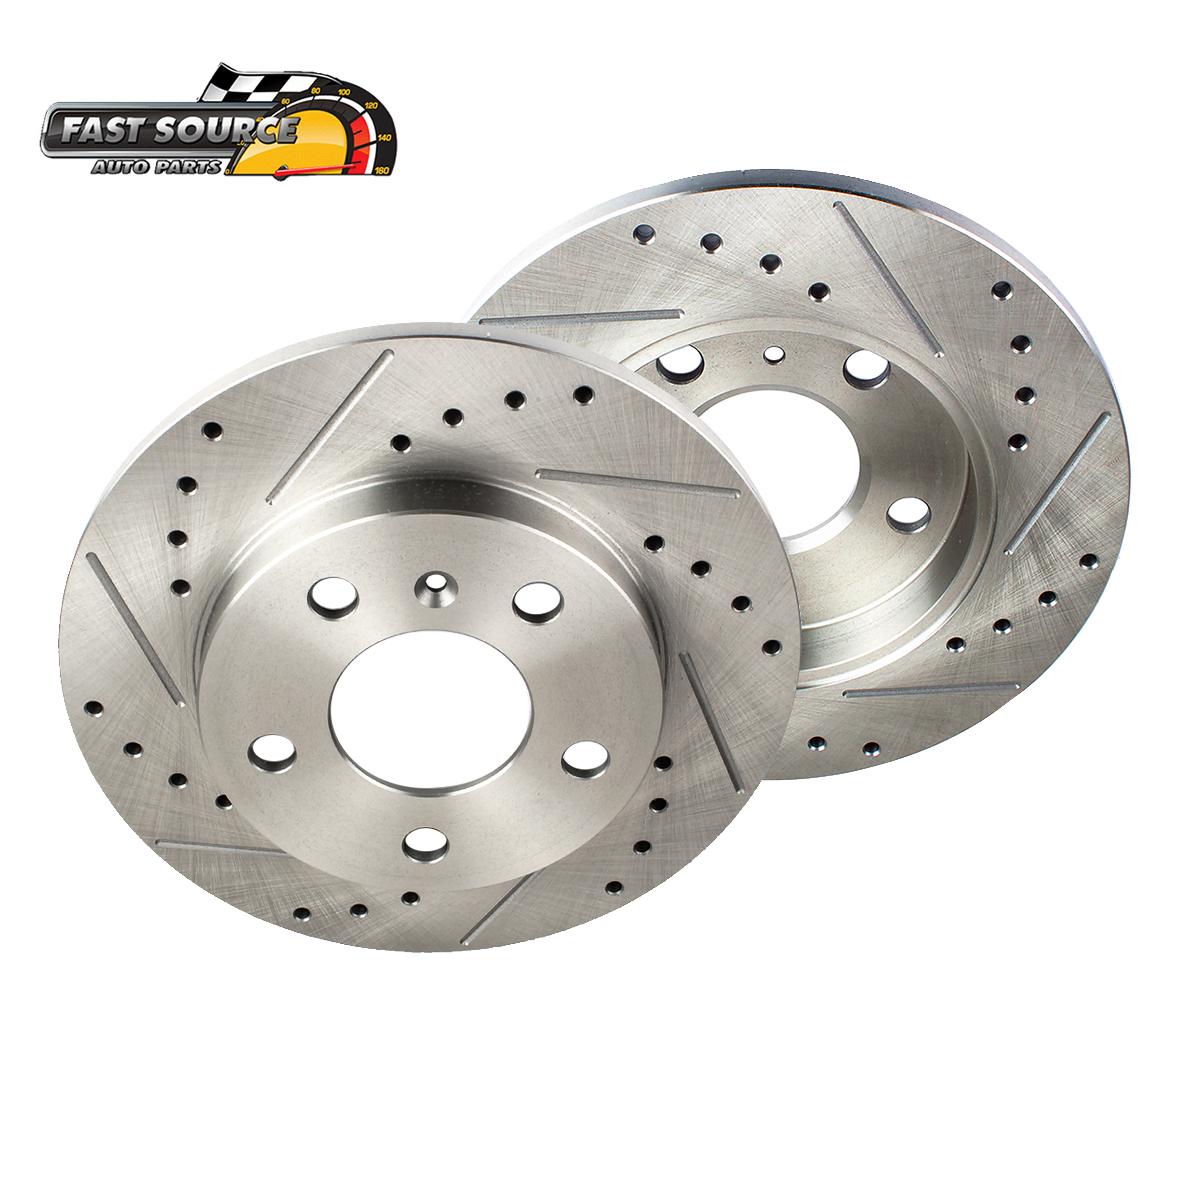 12 13 14 15 16 Honda CR-V OE Replacement Rotors w//Ceramic Pads F+R